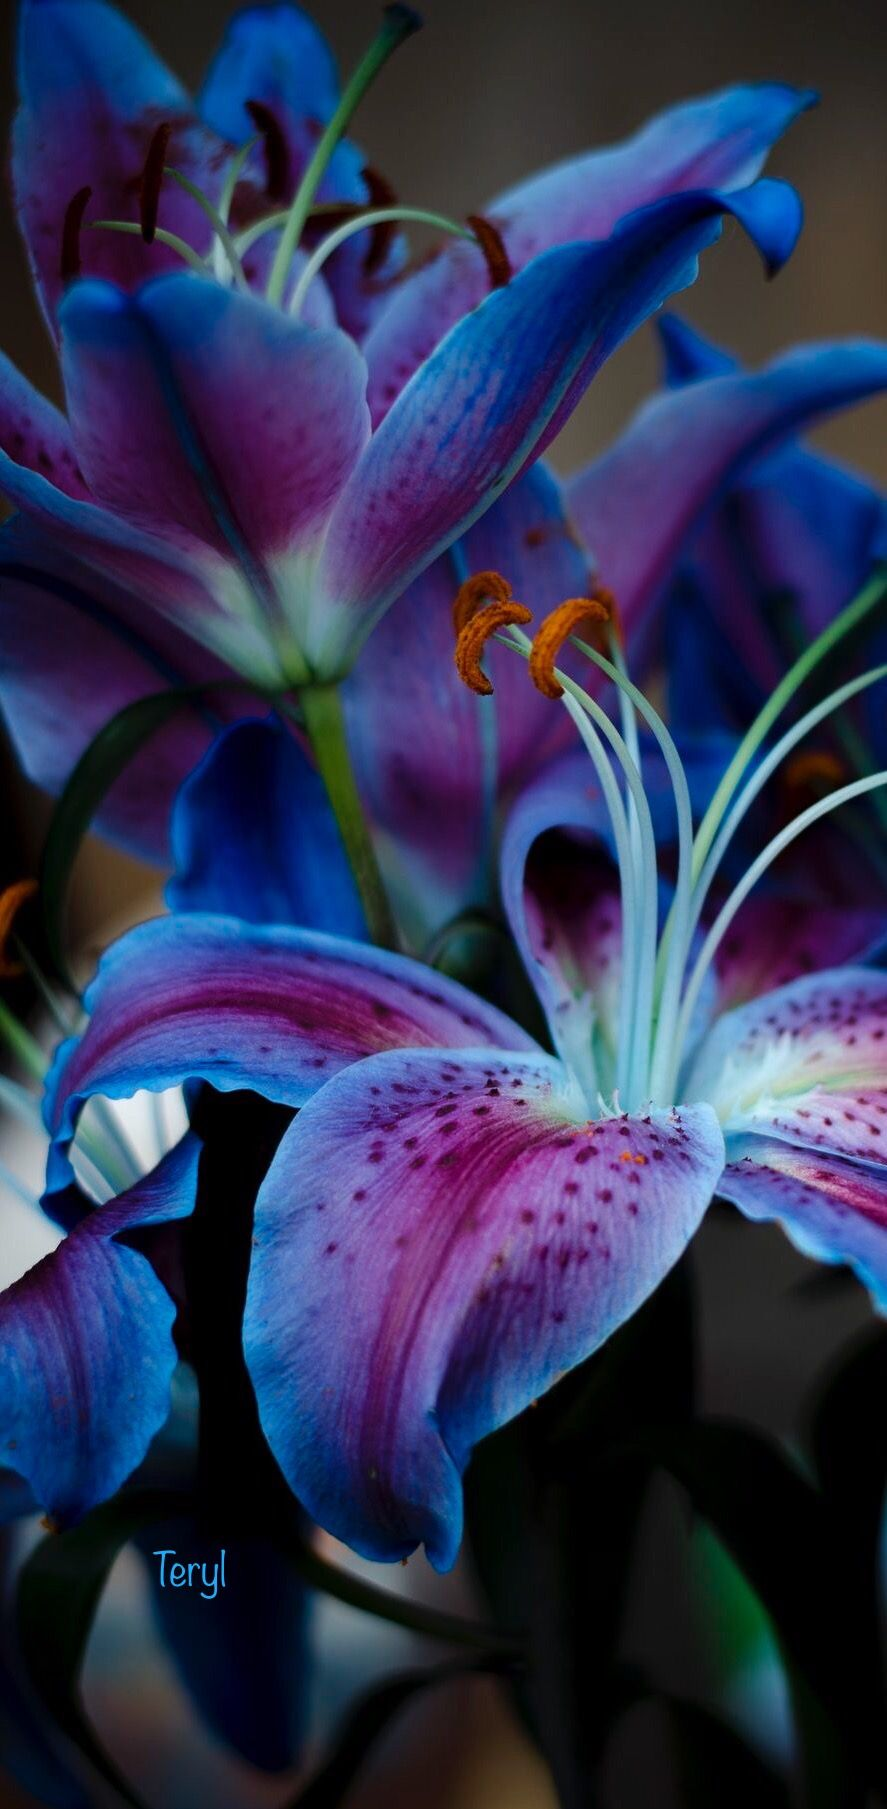 Pin By Teryl On Royalcobalt Blue Pinterest Flowers